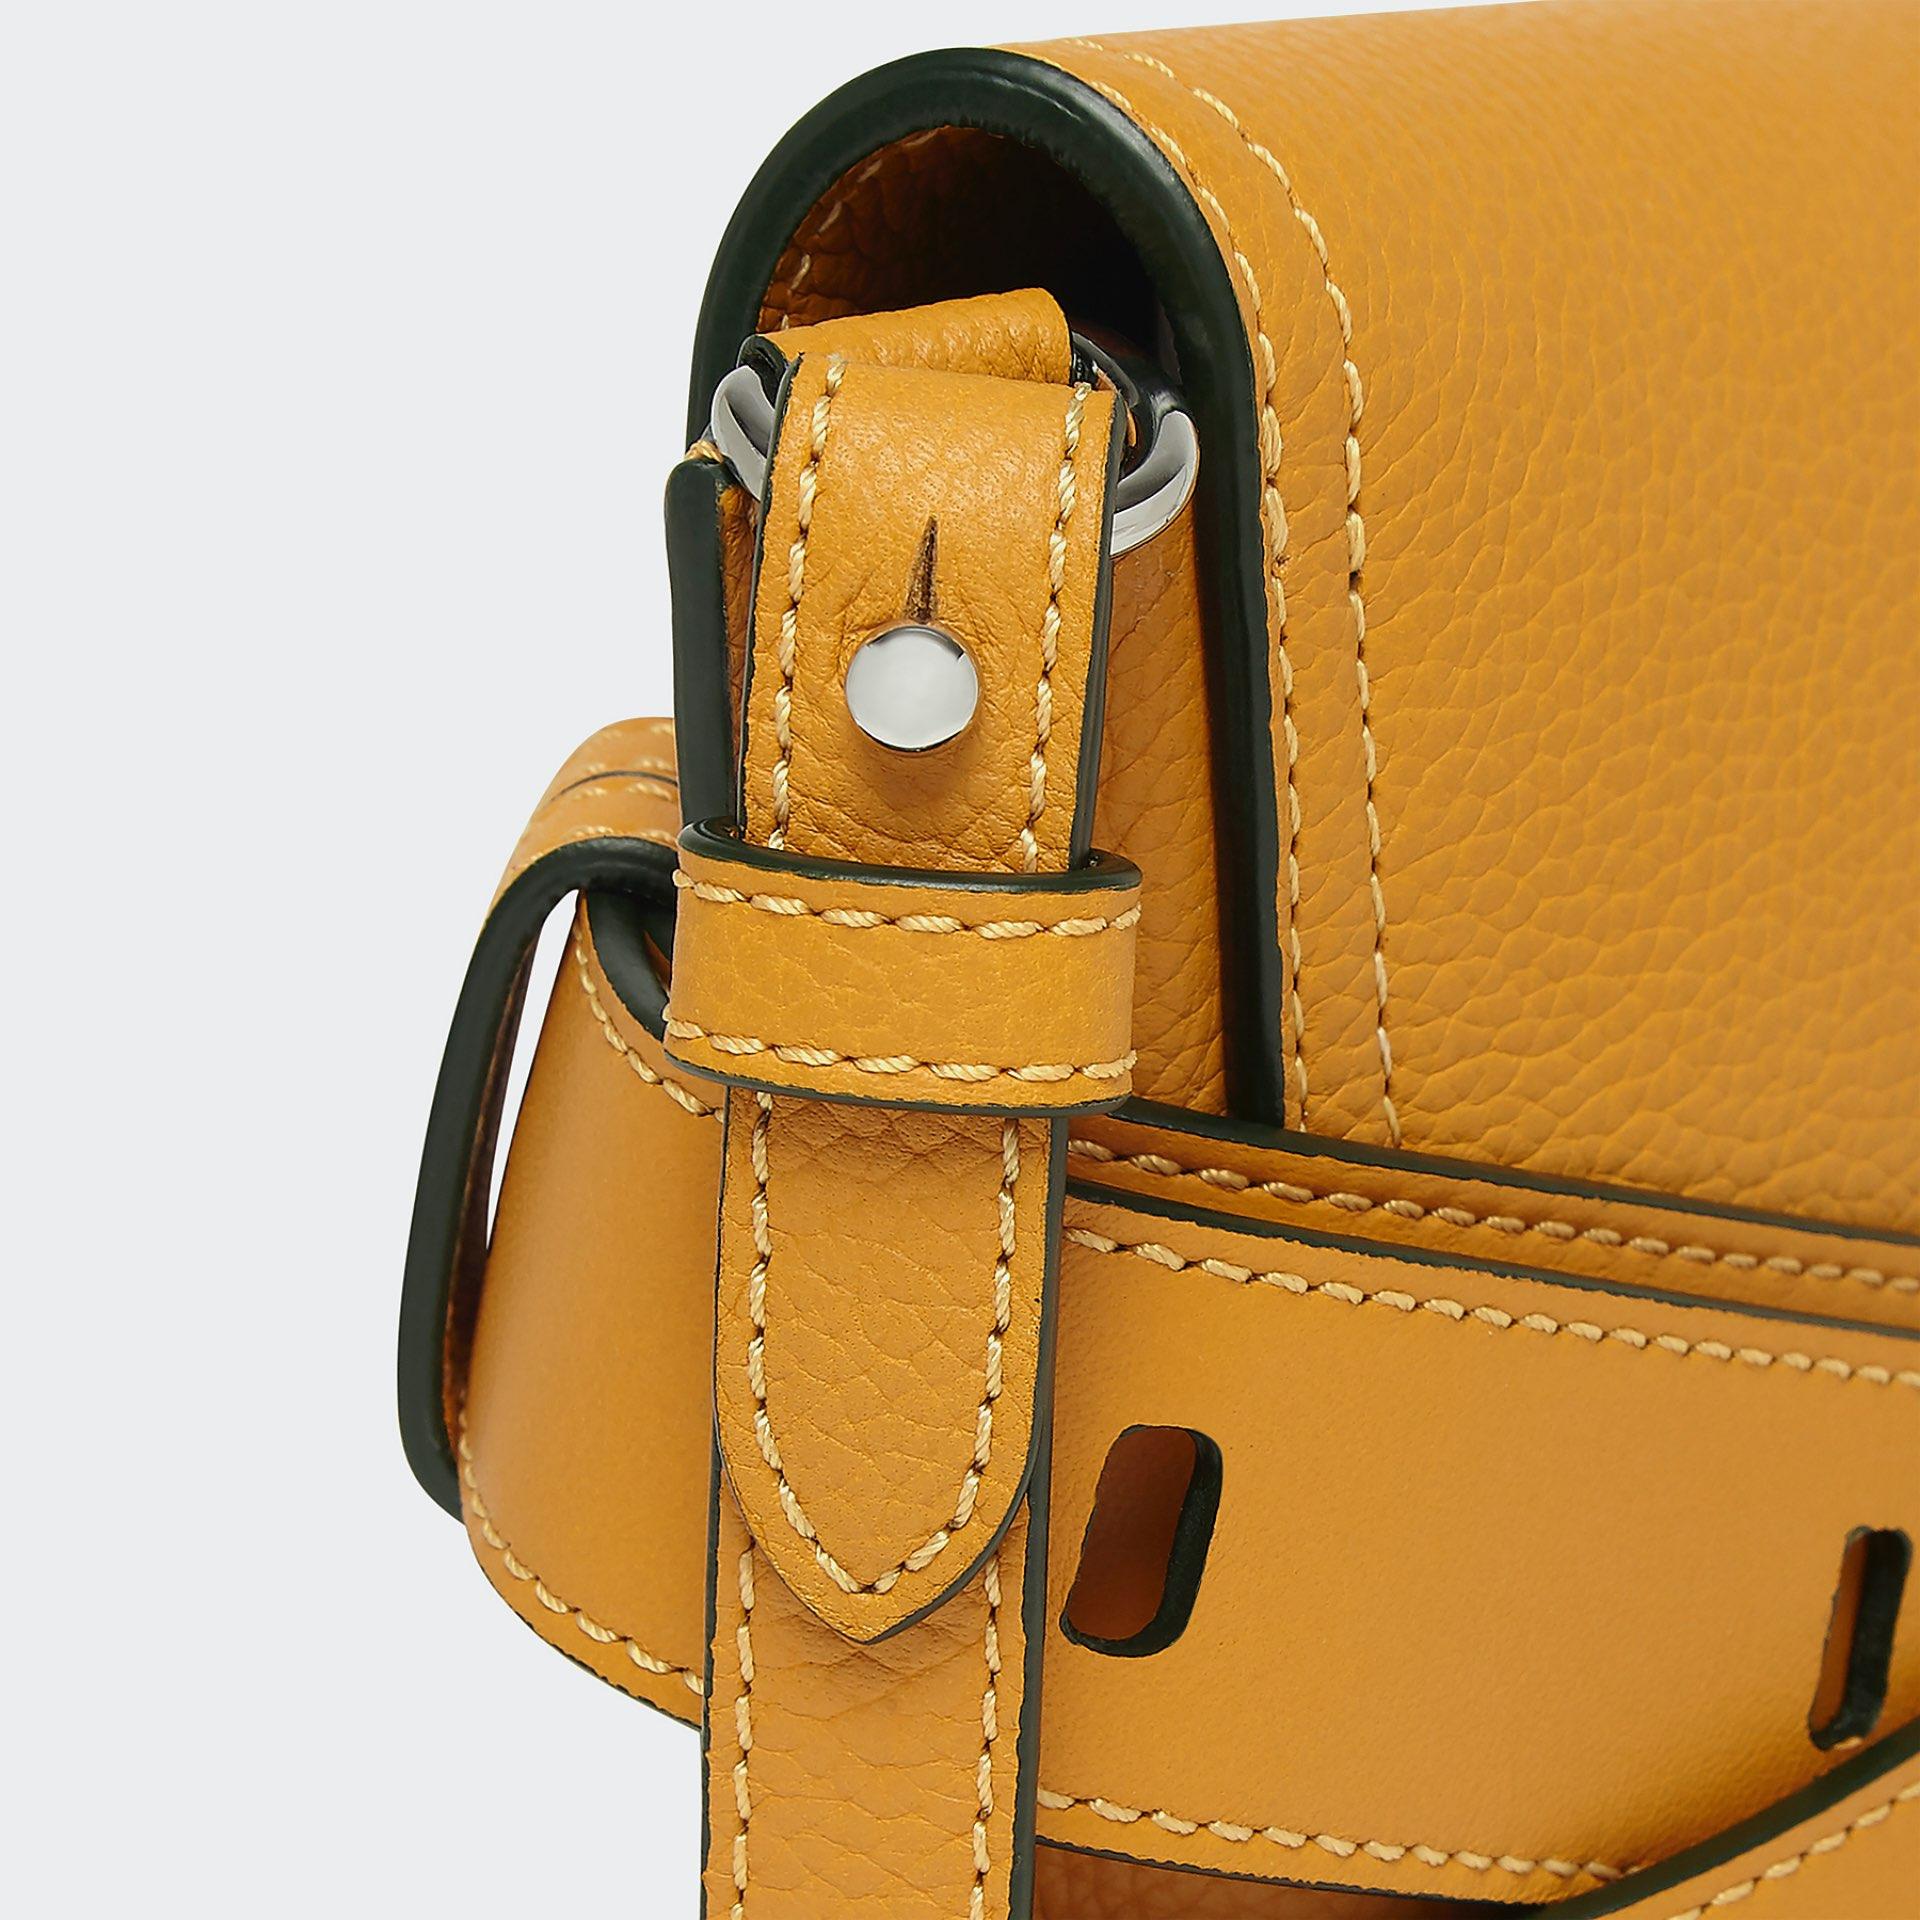 detail shot of J&M mustard yellow small handbag